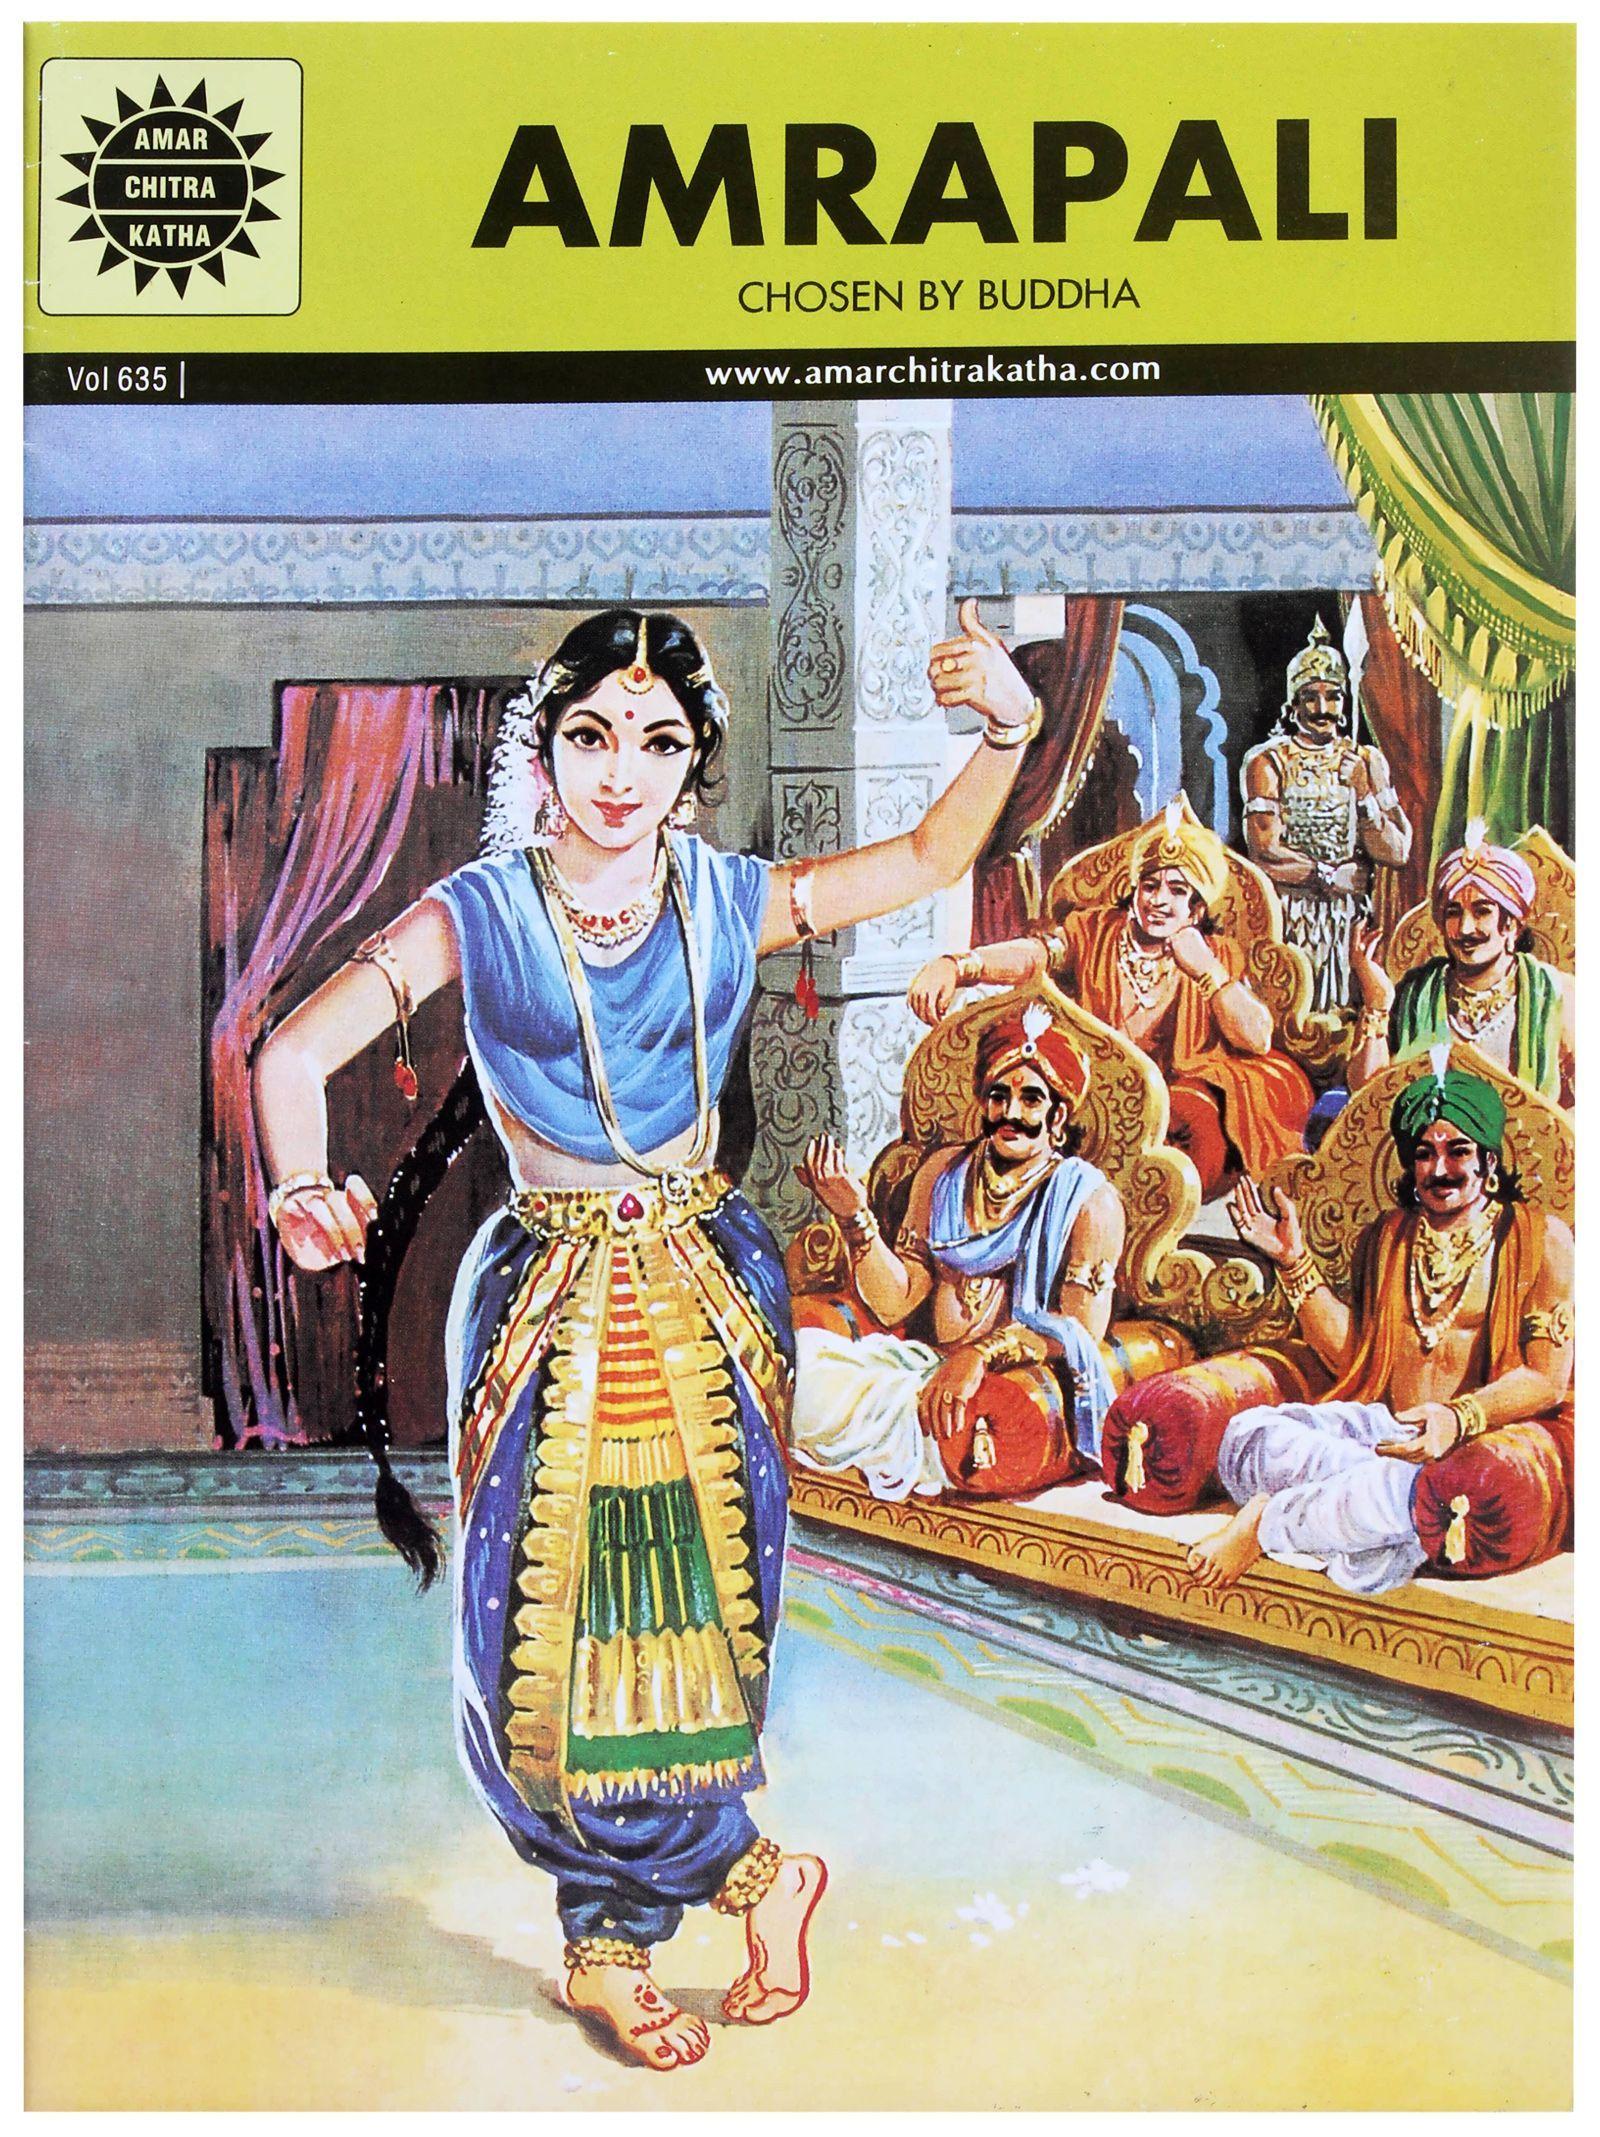 Amar Chitra Katha Amrapali Indian Comics Kids Story Books National Geographic Magazine Subscription